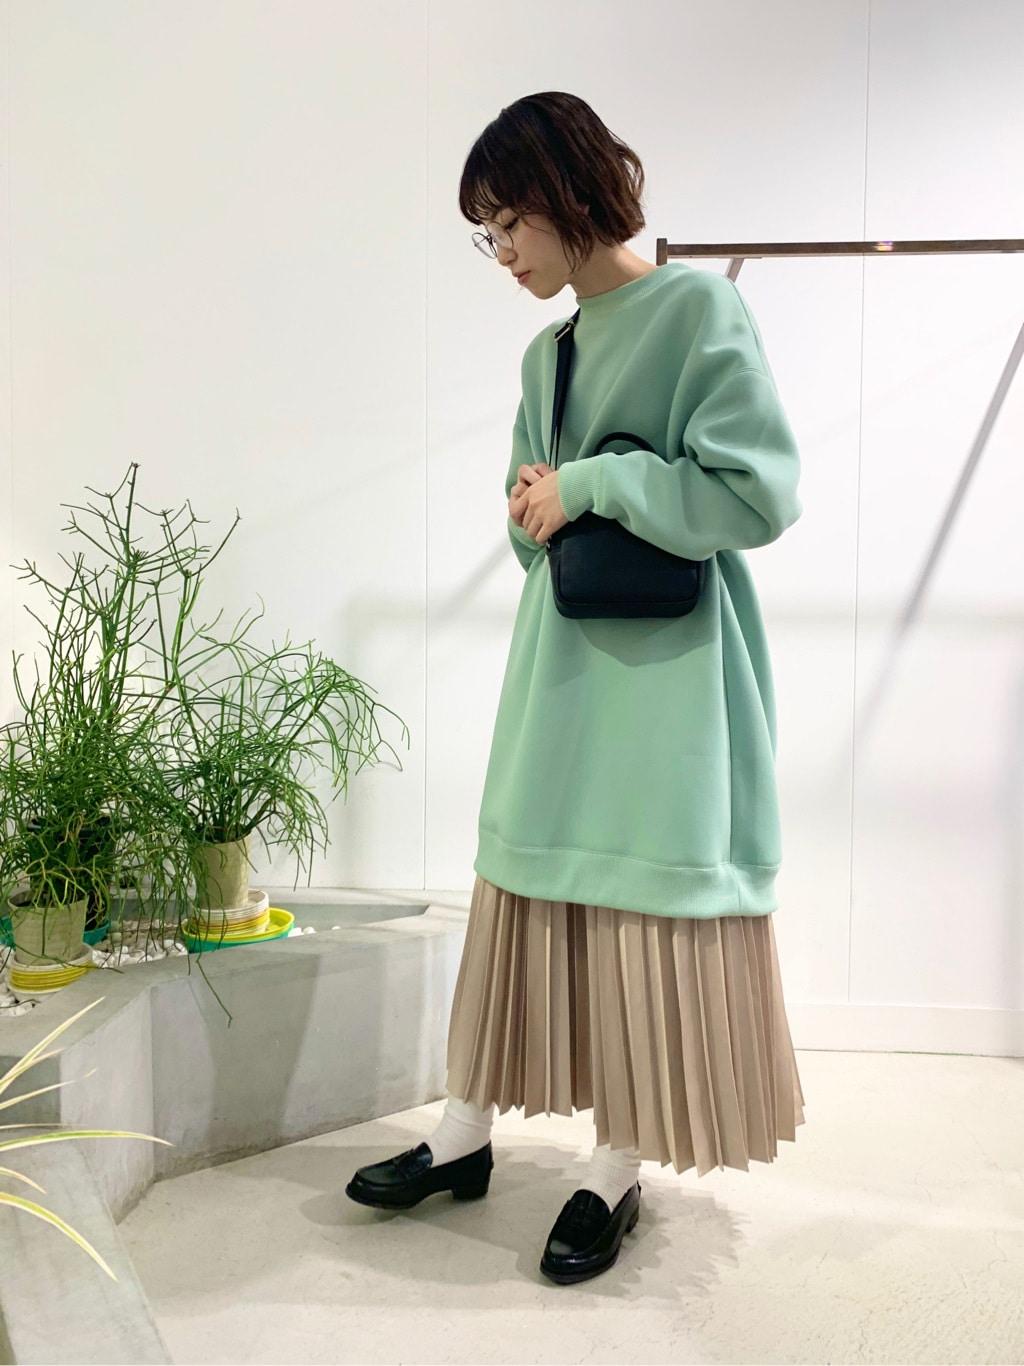 l'atelier du savon 名古屋栄路面 身長:161cm 2020.10.24